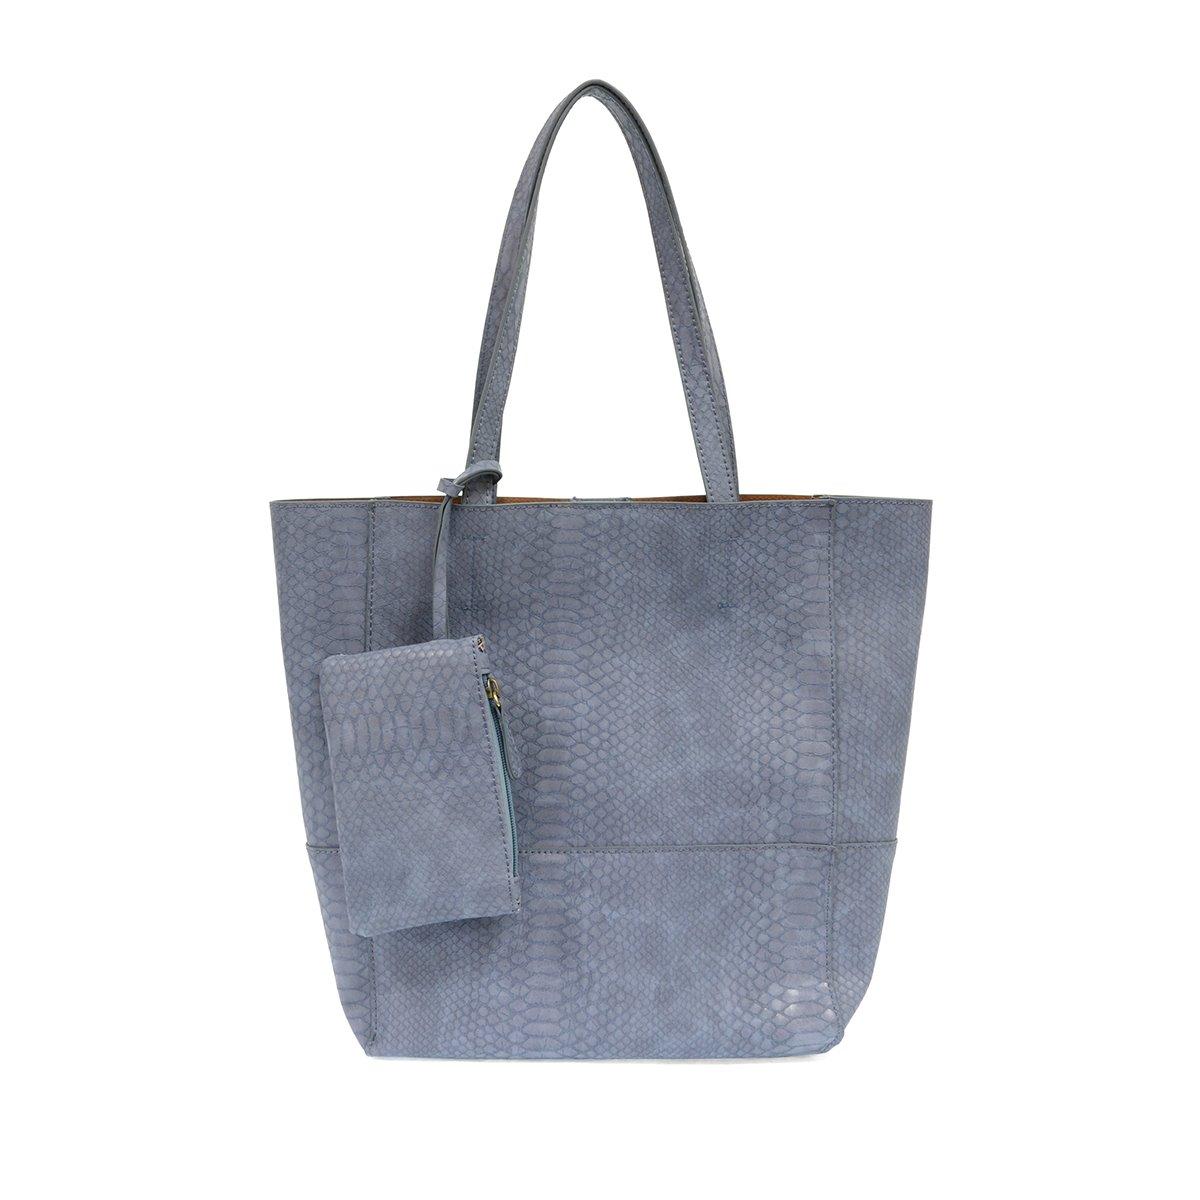 Chambray Avery Python Tote Handbag